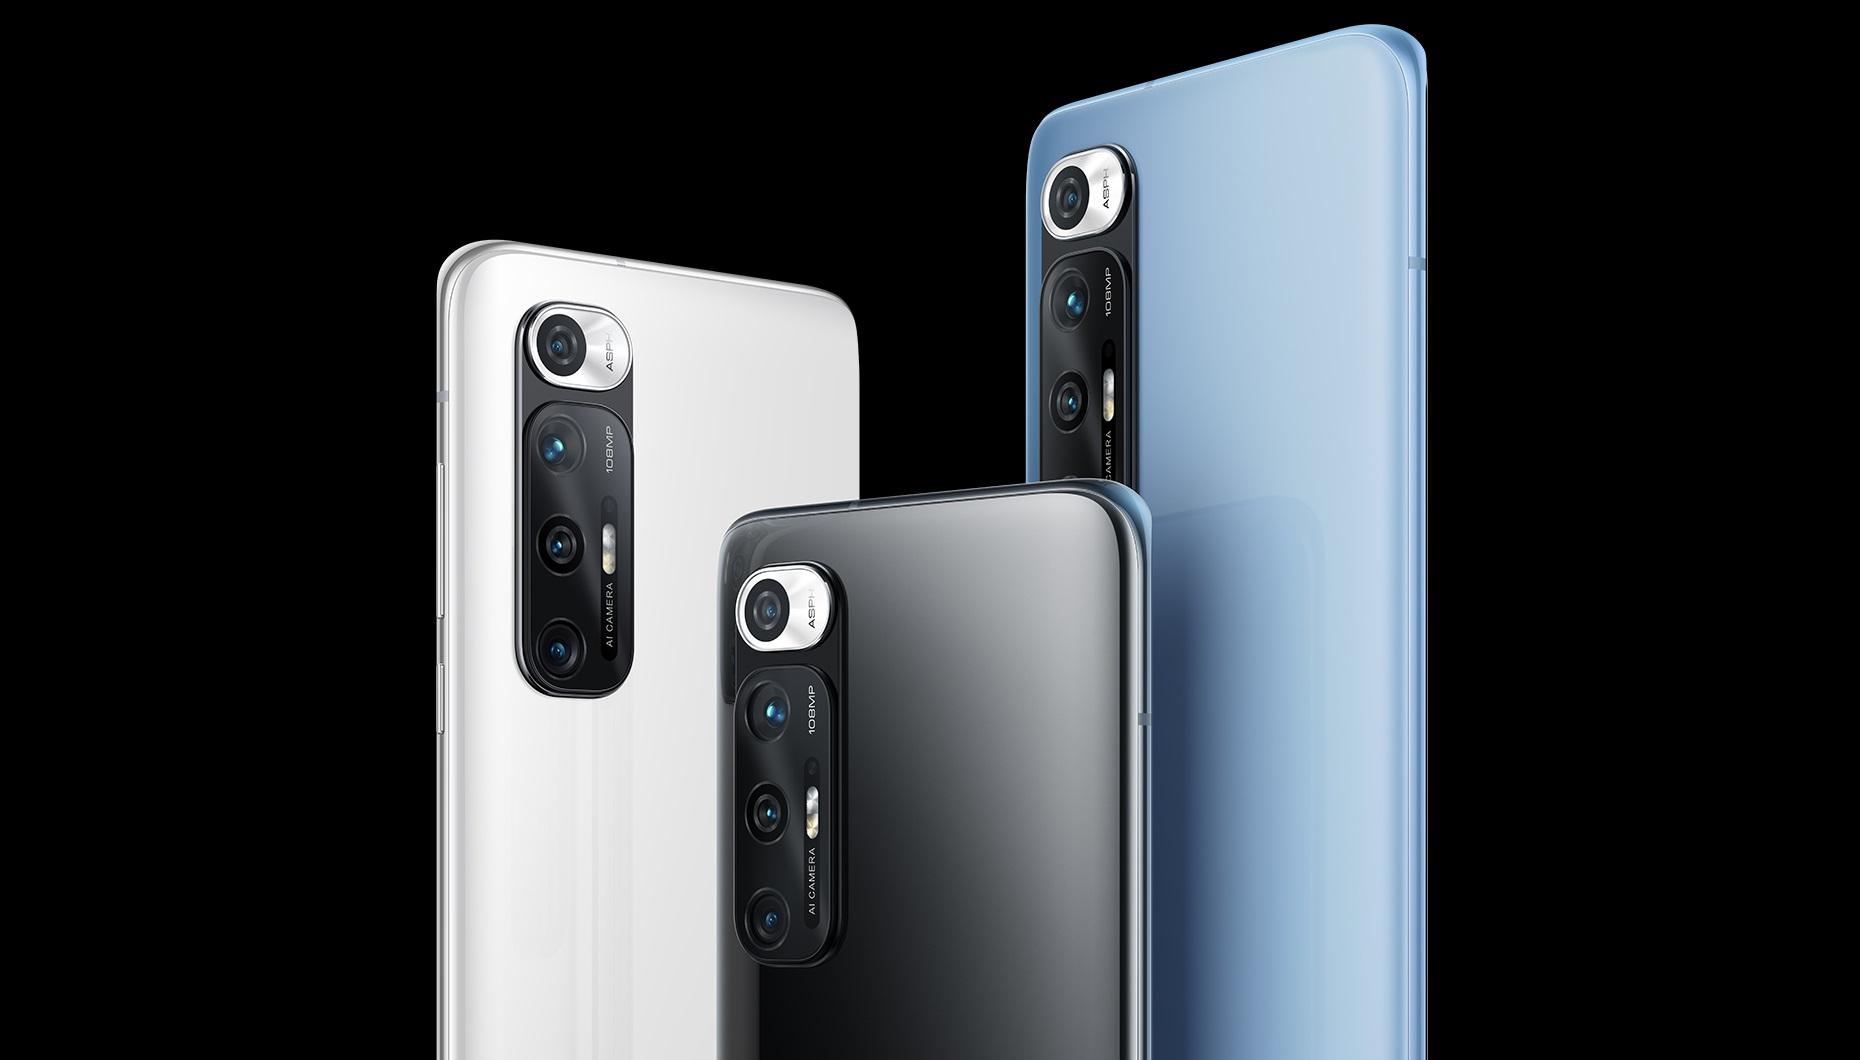 smartfon Xiaomi Mi 10S 5G smartphone